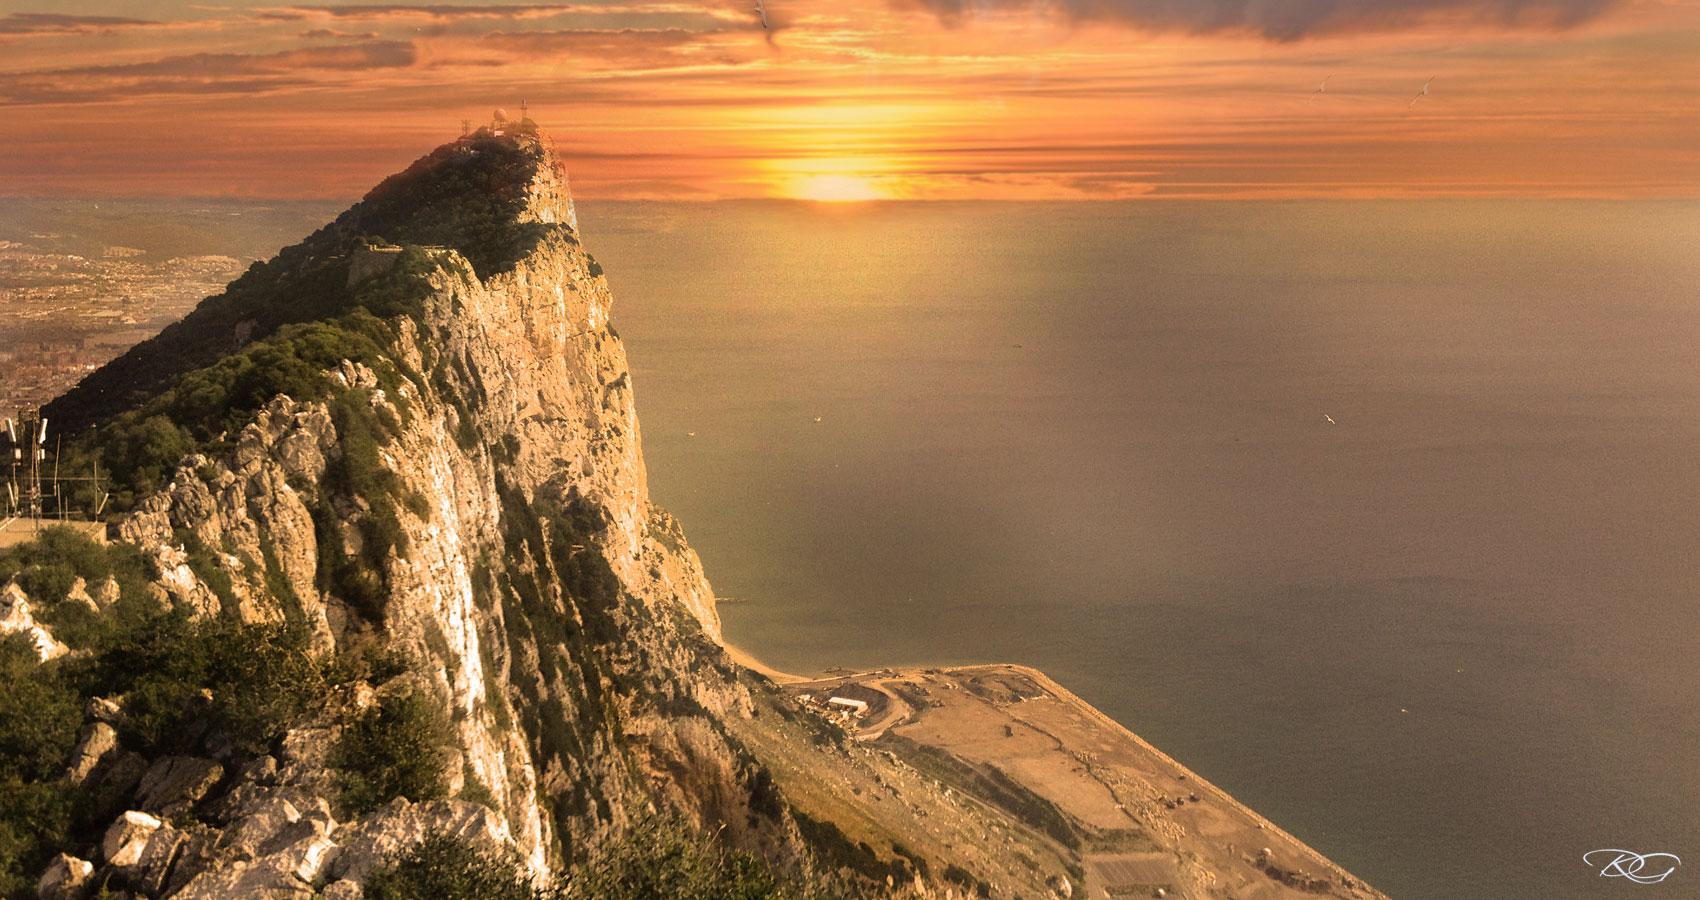 Dream Of Gibraltar by Nara Hodge at Spillwords.com